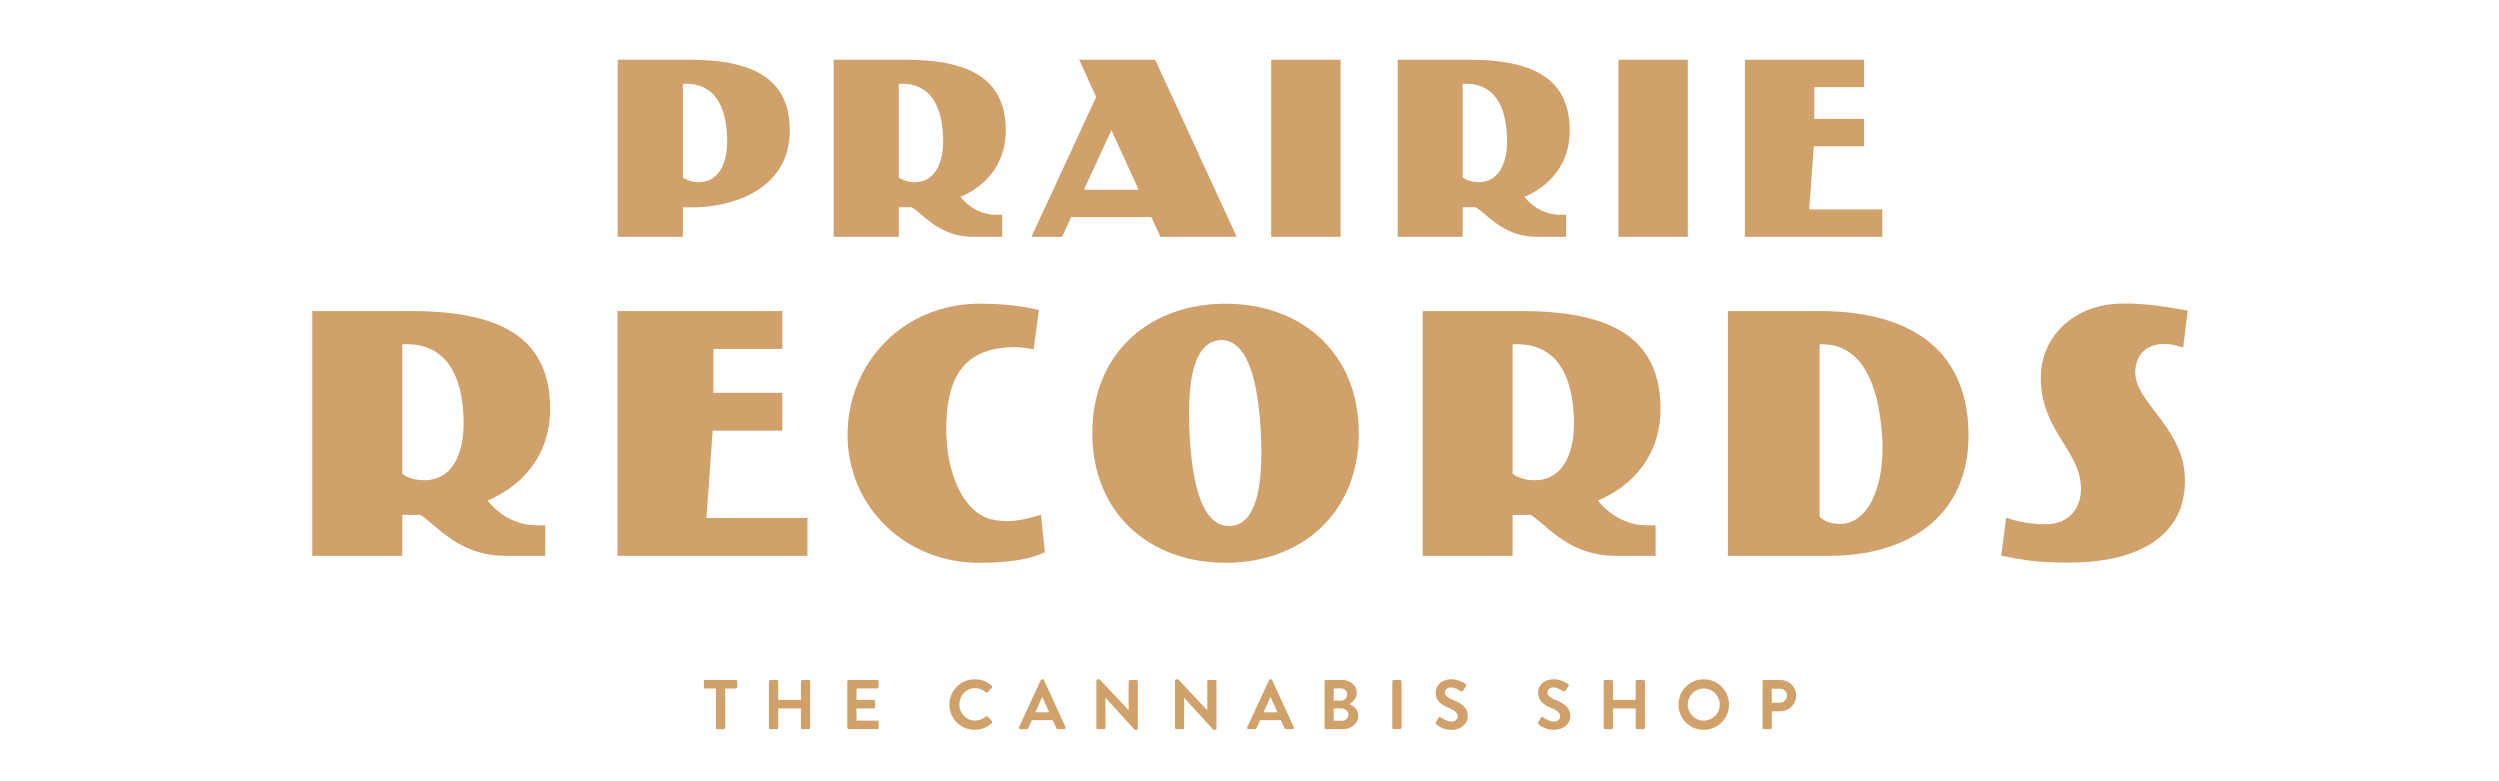 Prairie Records celebrates the instinctual ties between recreational cannabis and music. - 720 Broadway Avenue, Saskatoon, SK